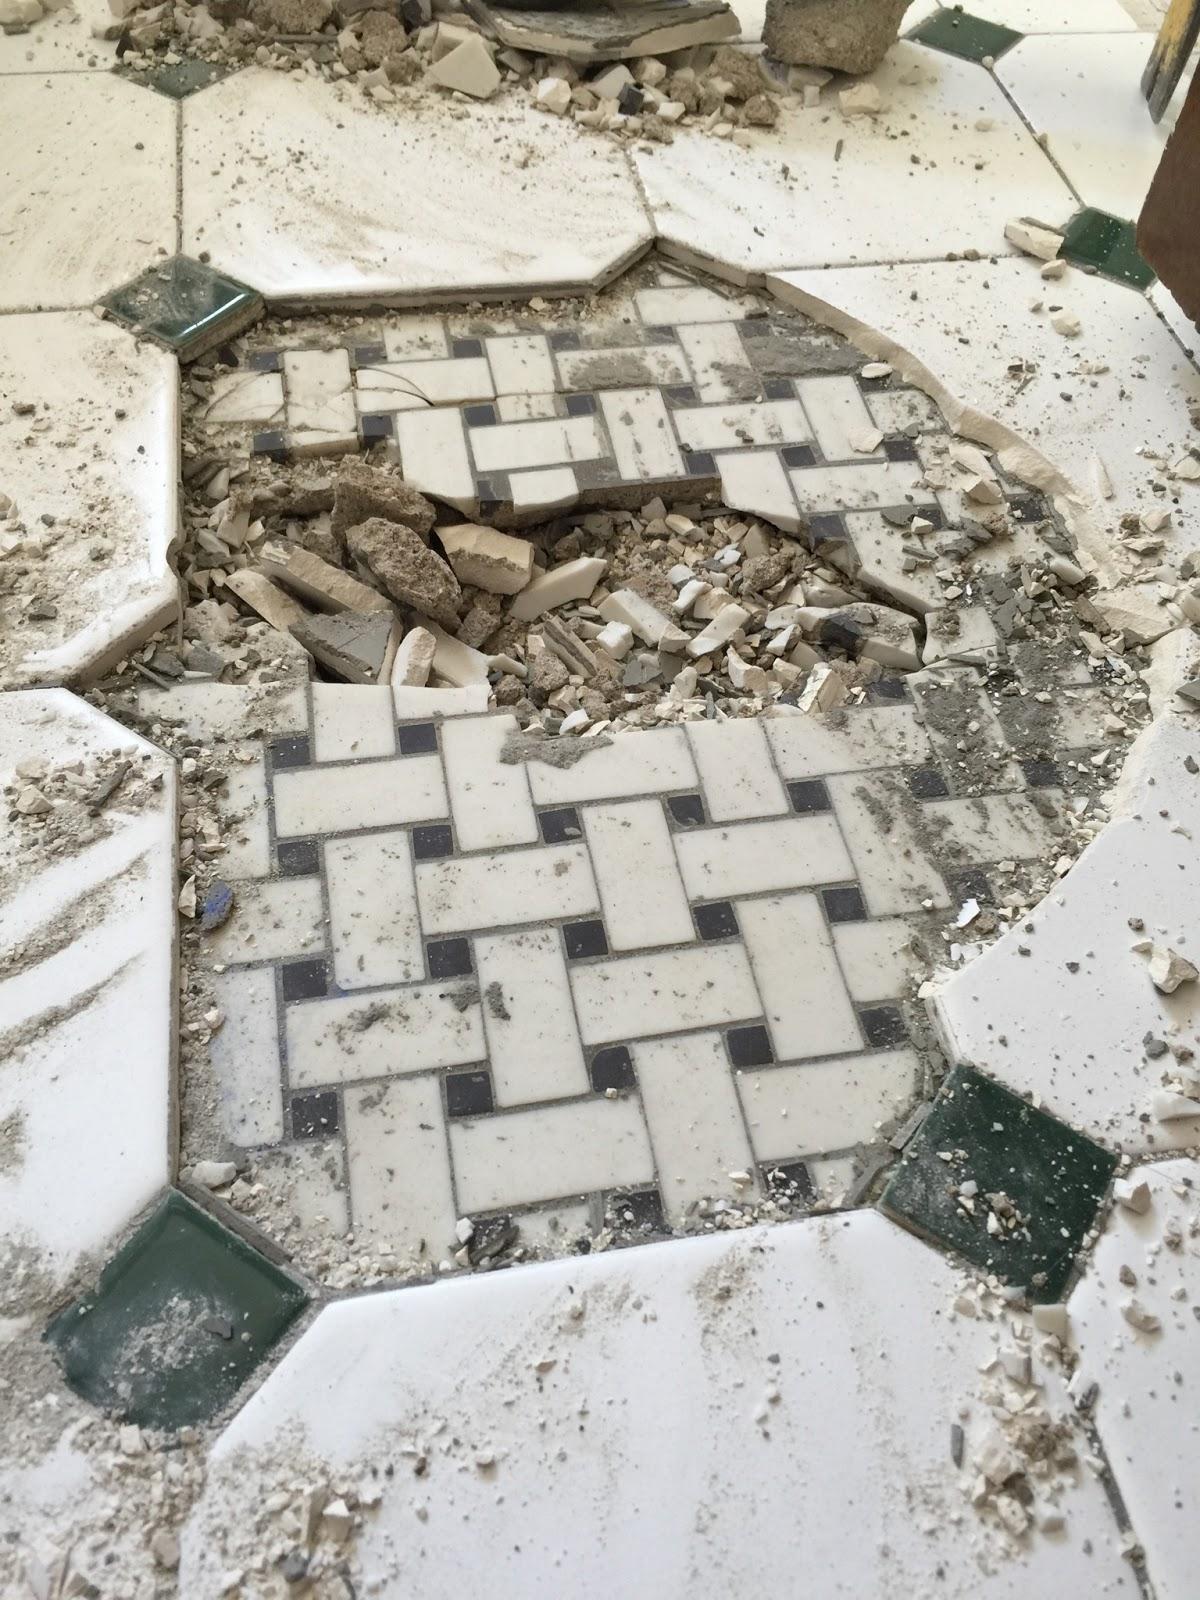 Depression Era Bathroom Tiles - Home with Keki